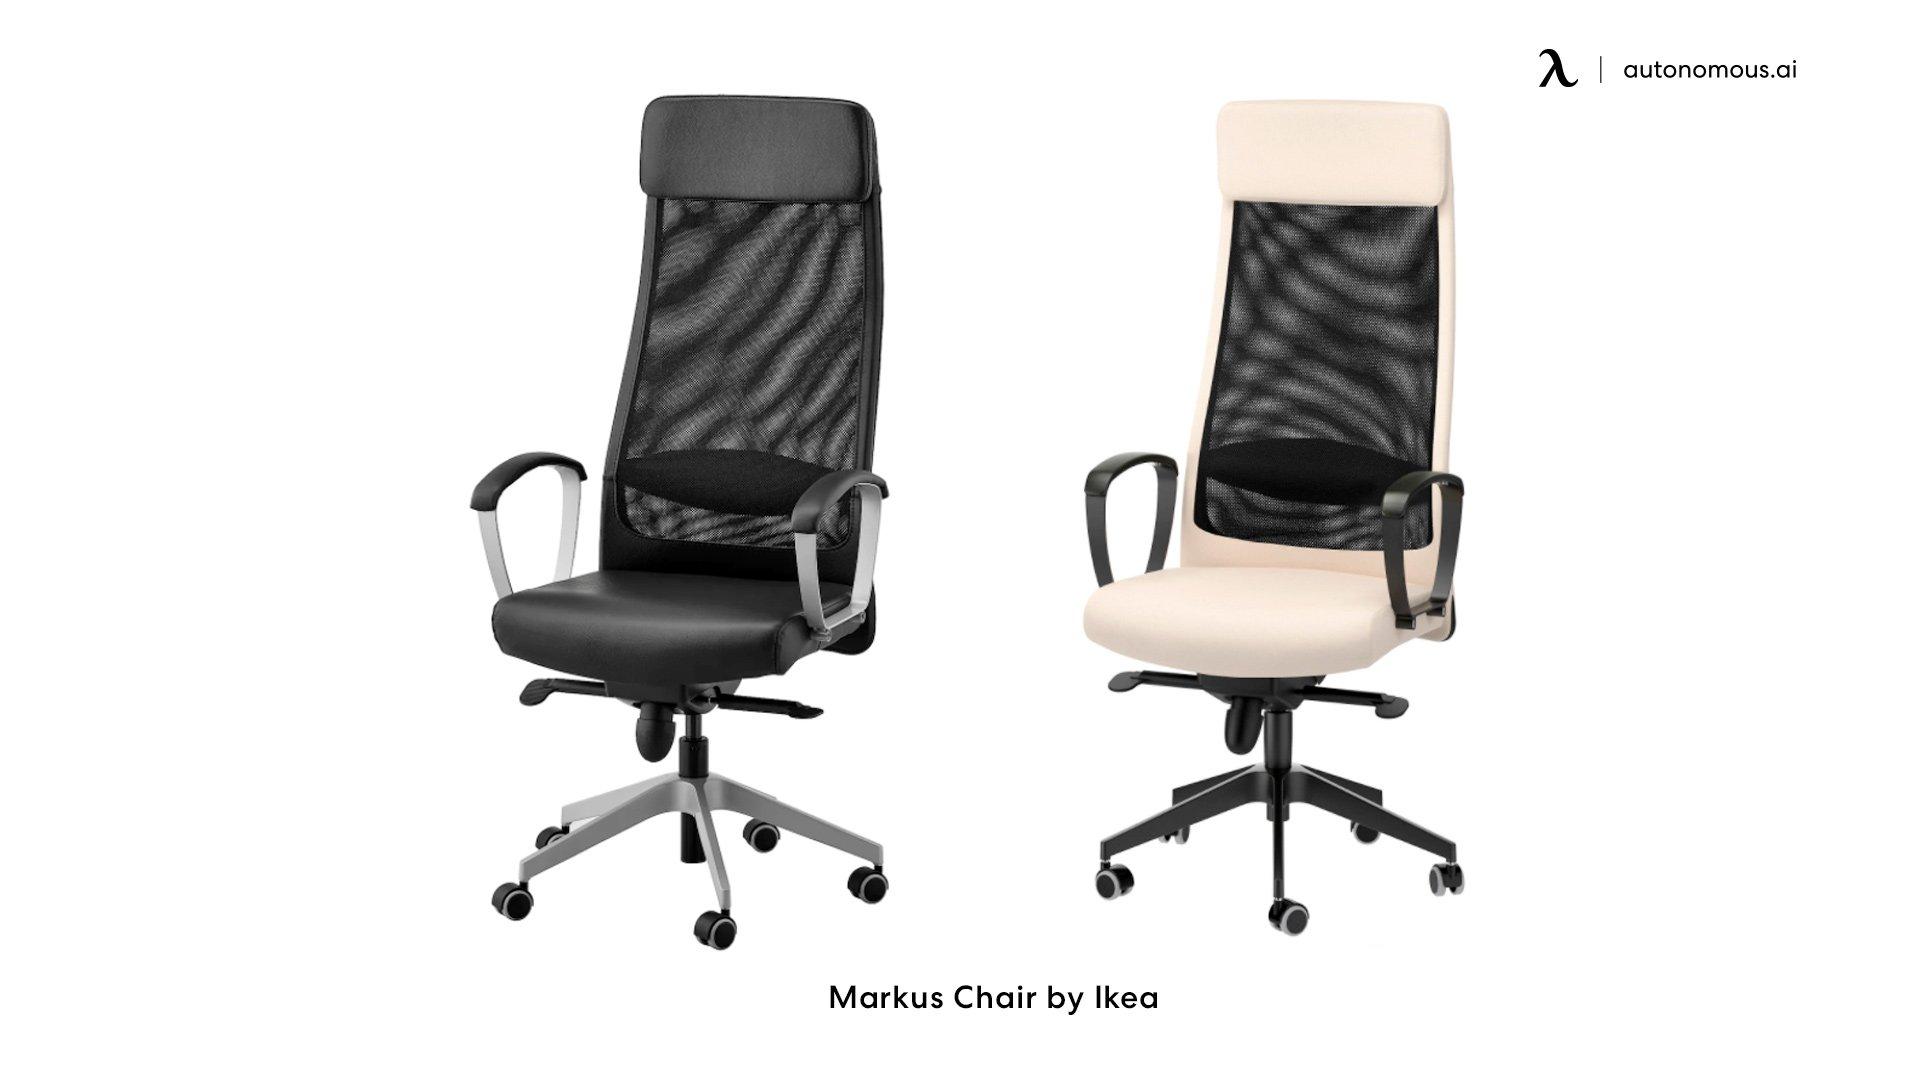 Markus office chair design